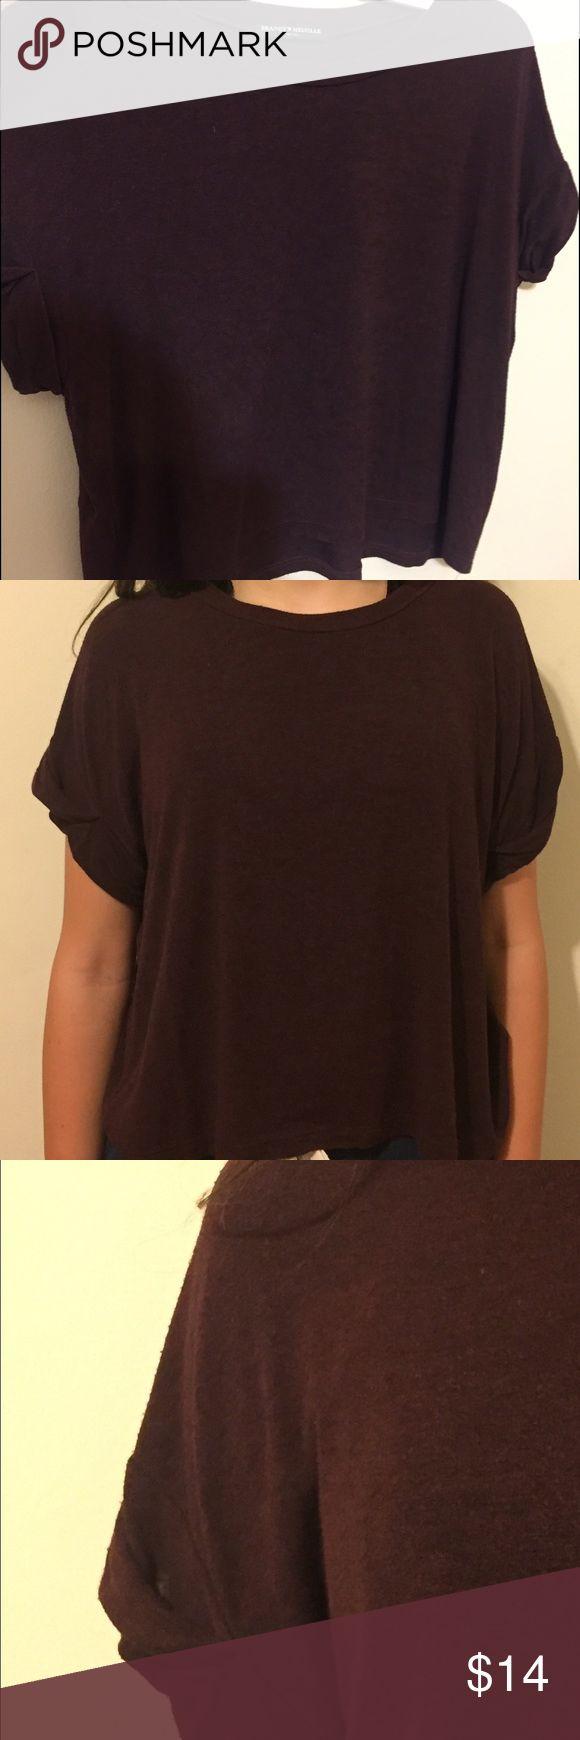 burgundy shirt (worn)no stains, in good condition. (worn)no stains, in good condition. Folded sleeve design . Brandy Melville Tops